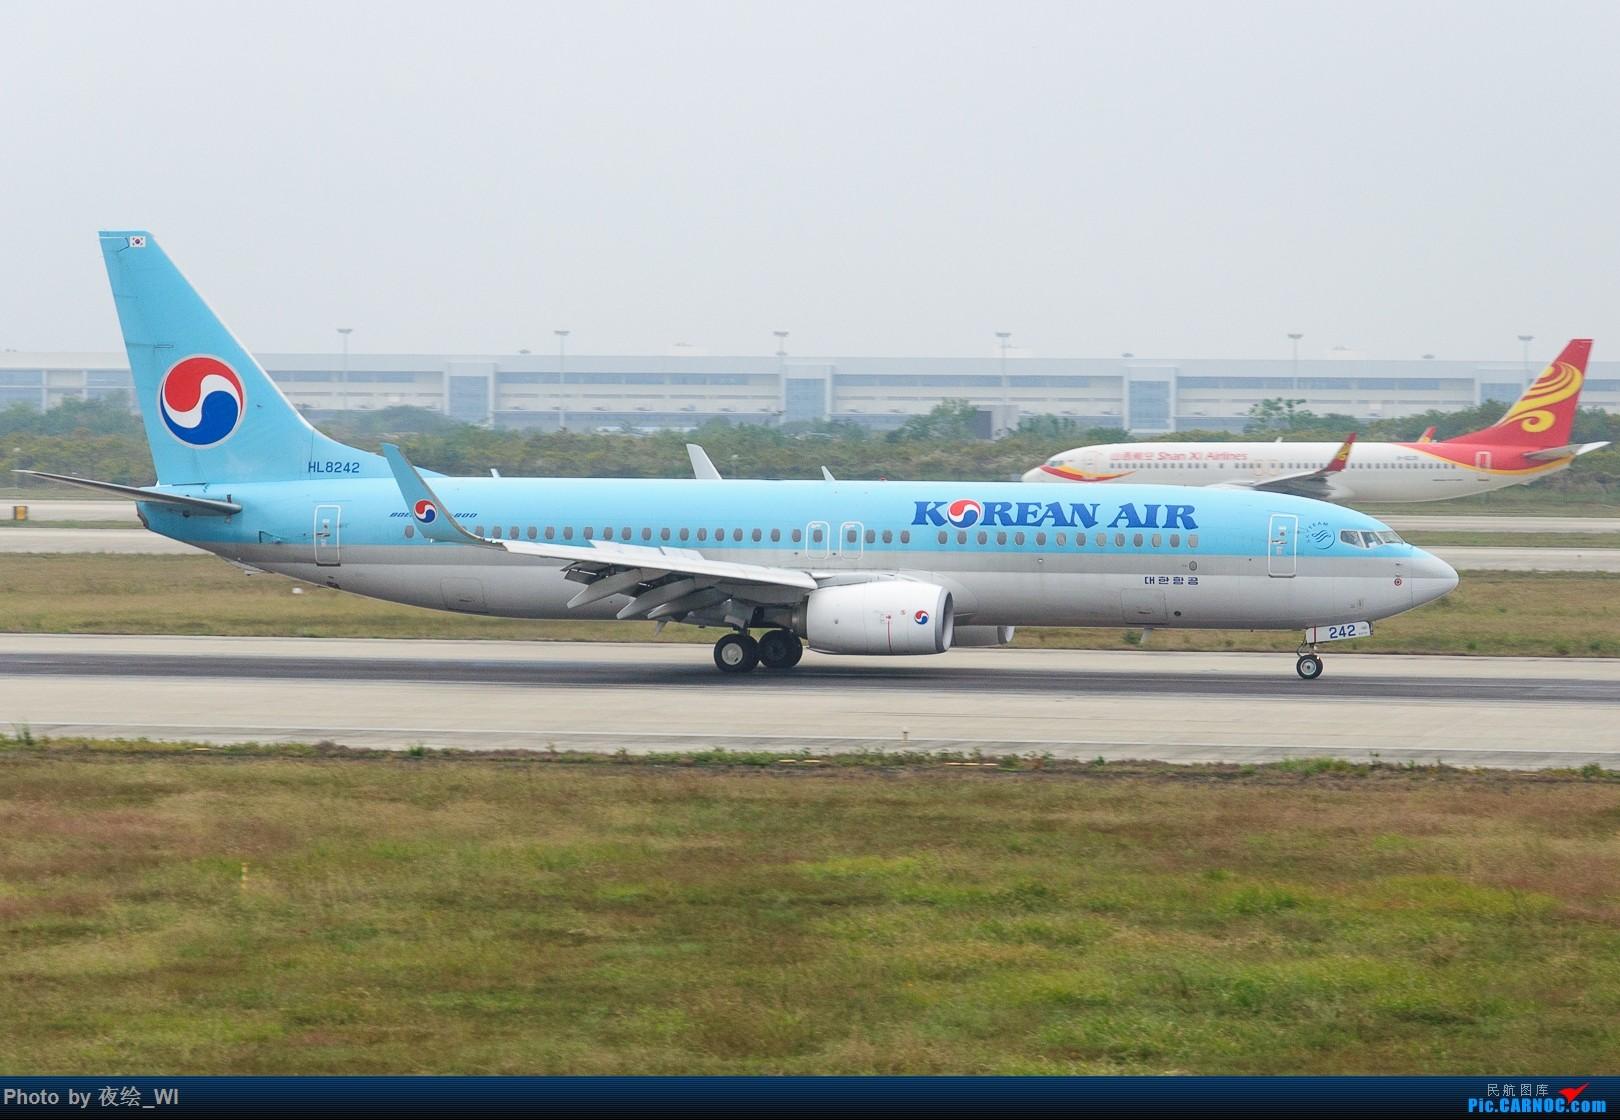 Re:[原创]【NKG】生日也要拍飞机,珍惜南京久违的单跑运行时光 BOEING 737-800 HL8242 中国南京禄口国际机场